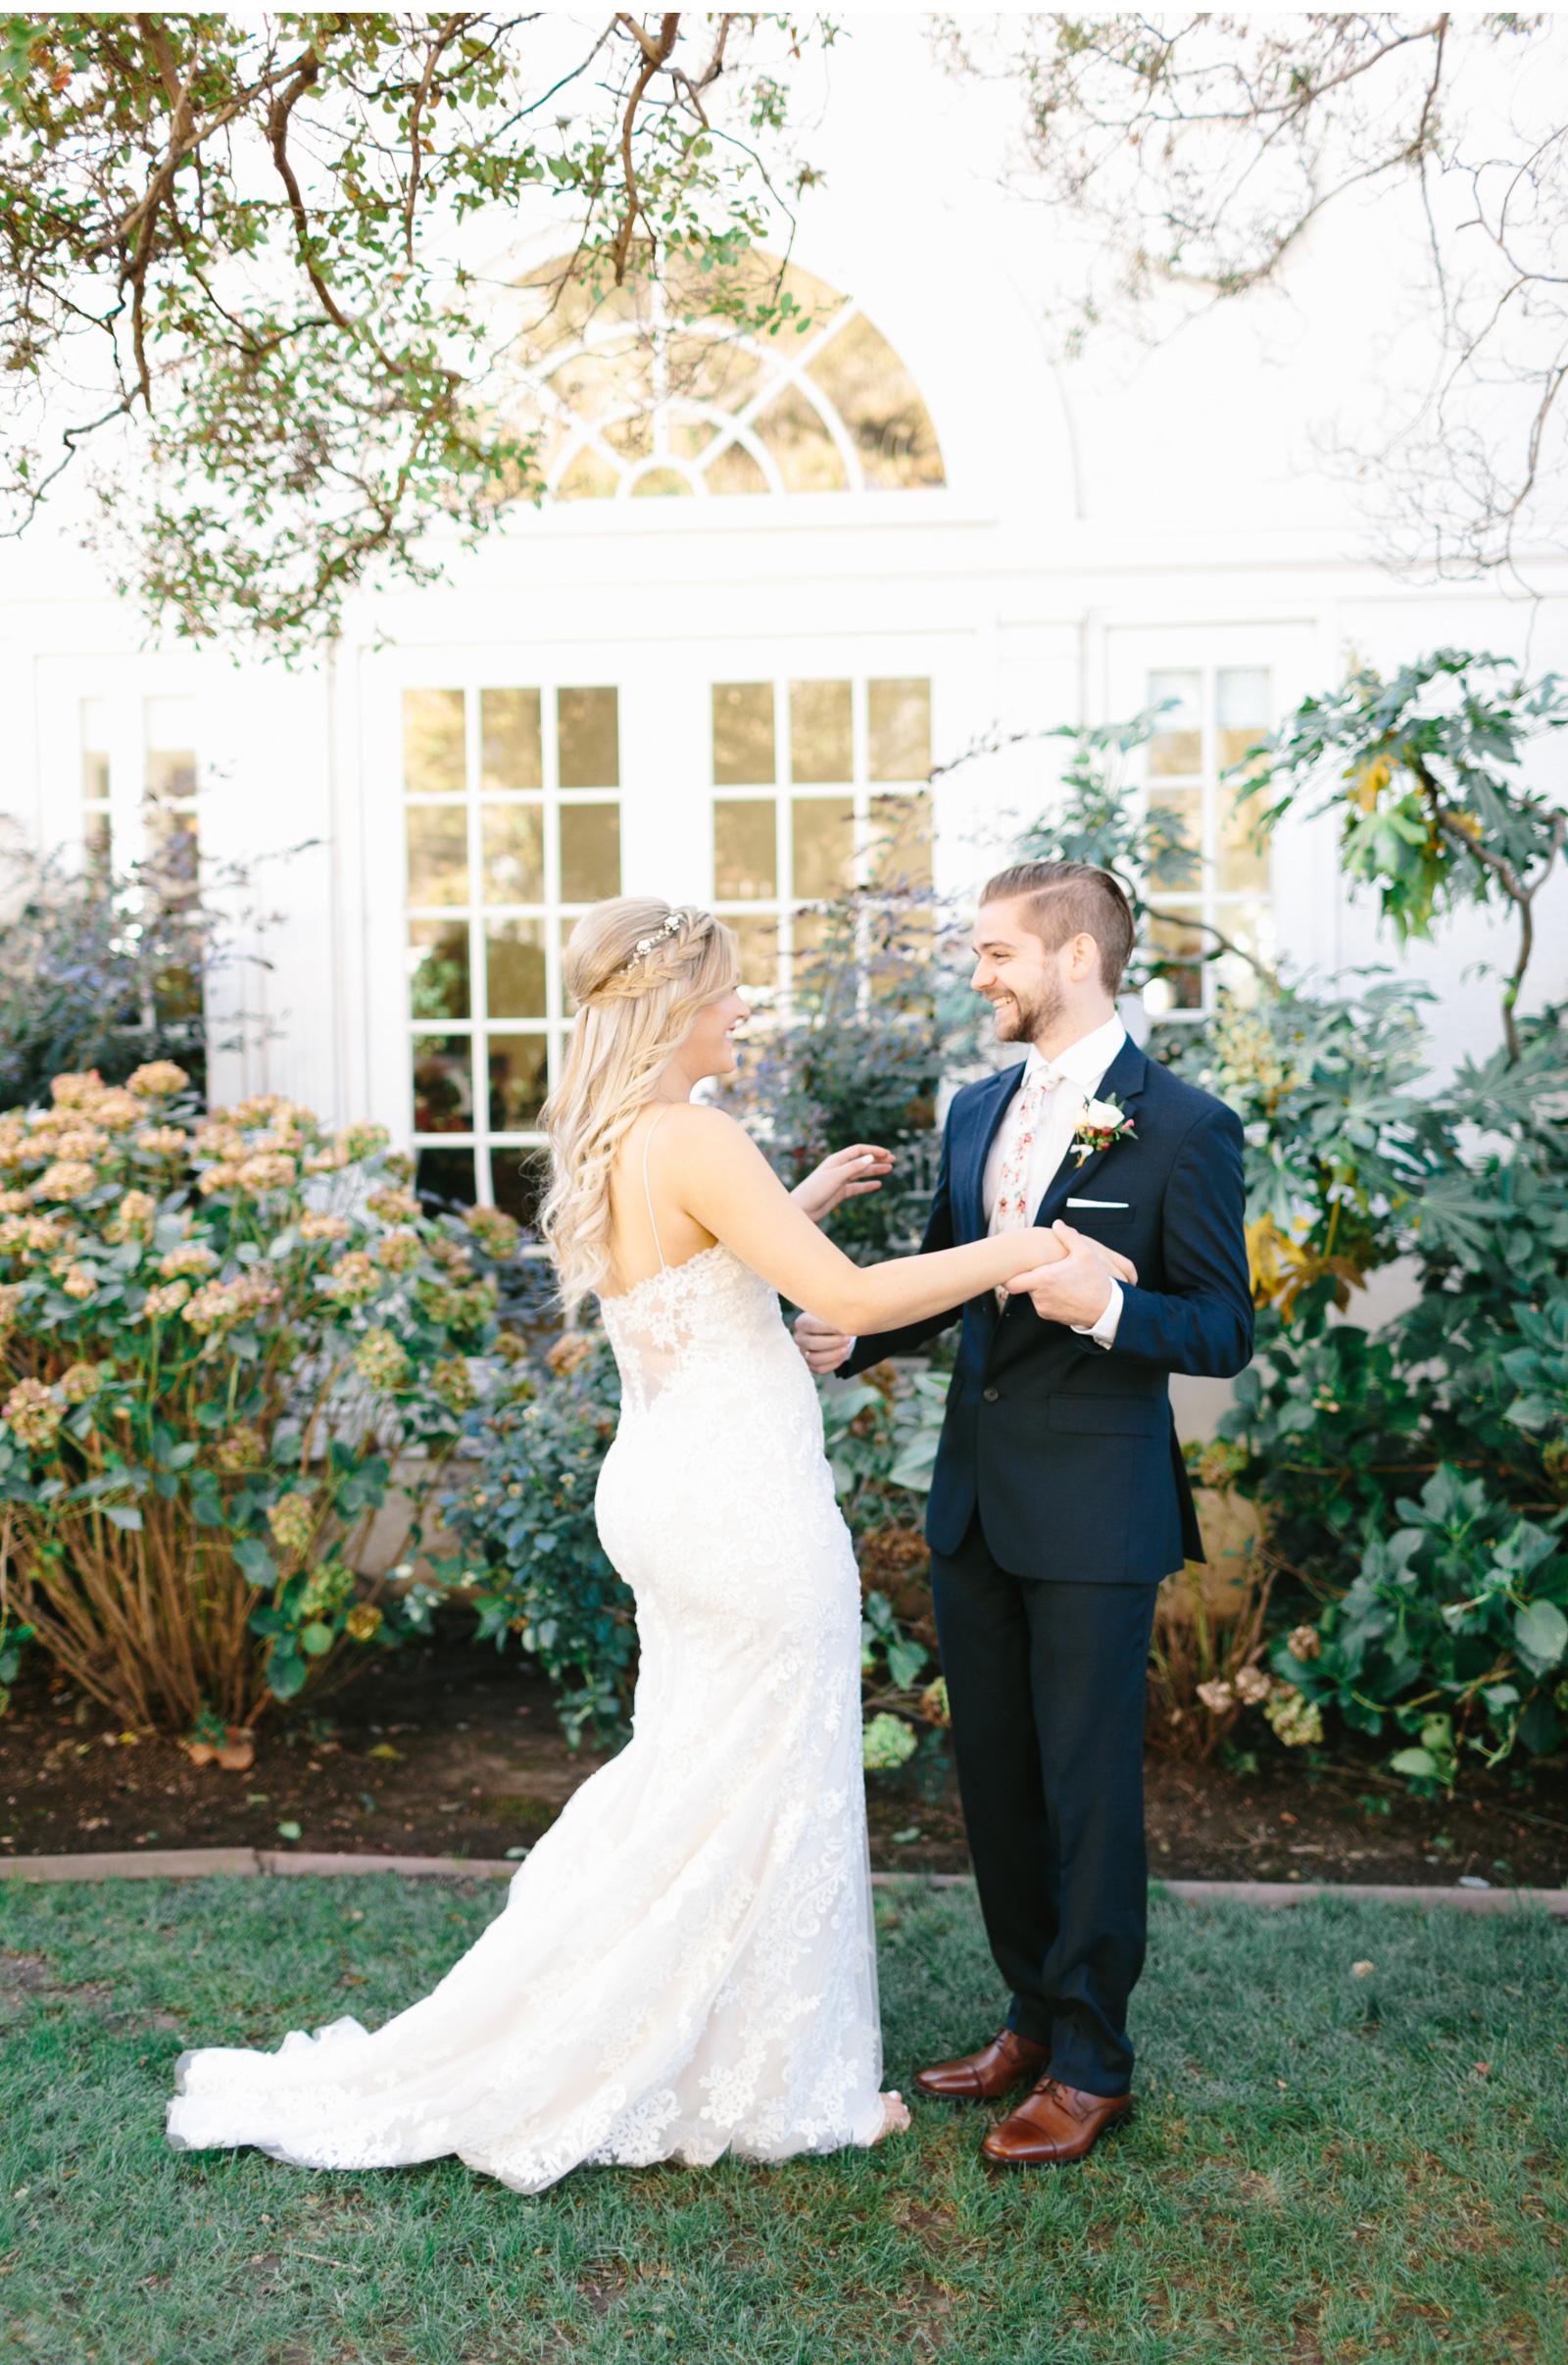 Malibu-Wedding-Photographer-Natalie-Schutt-Photography-Vizcaya_07.jpg